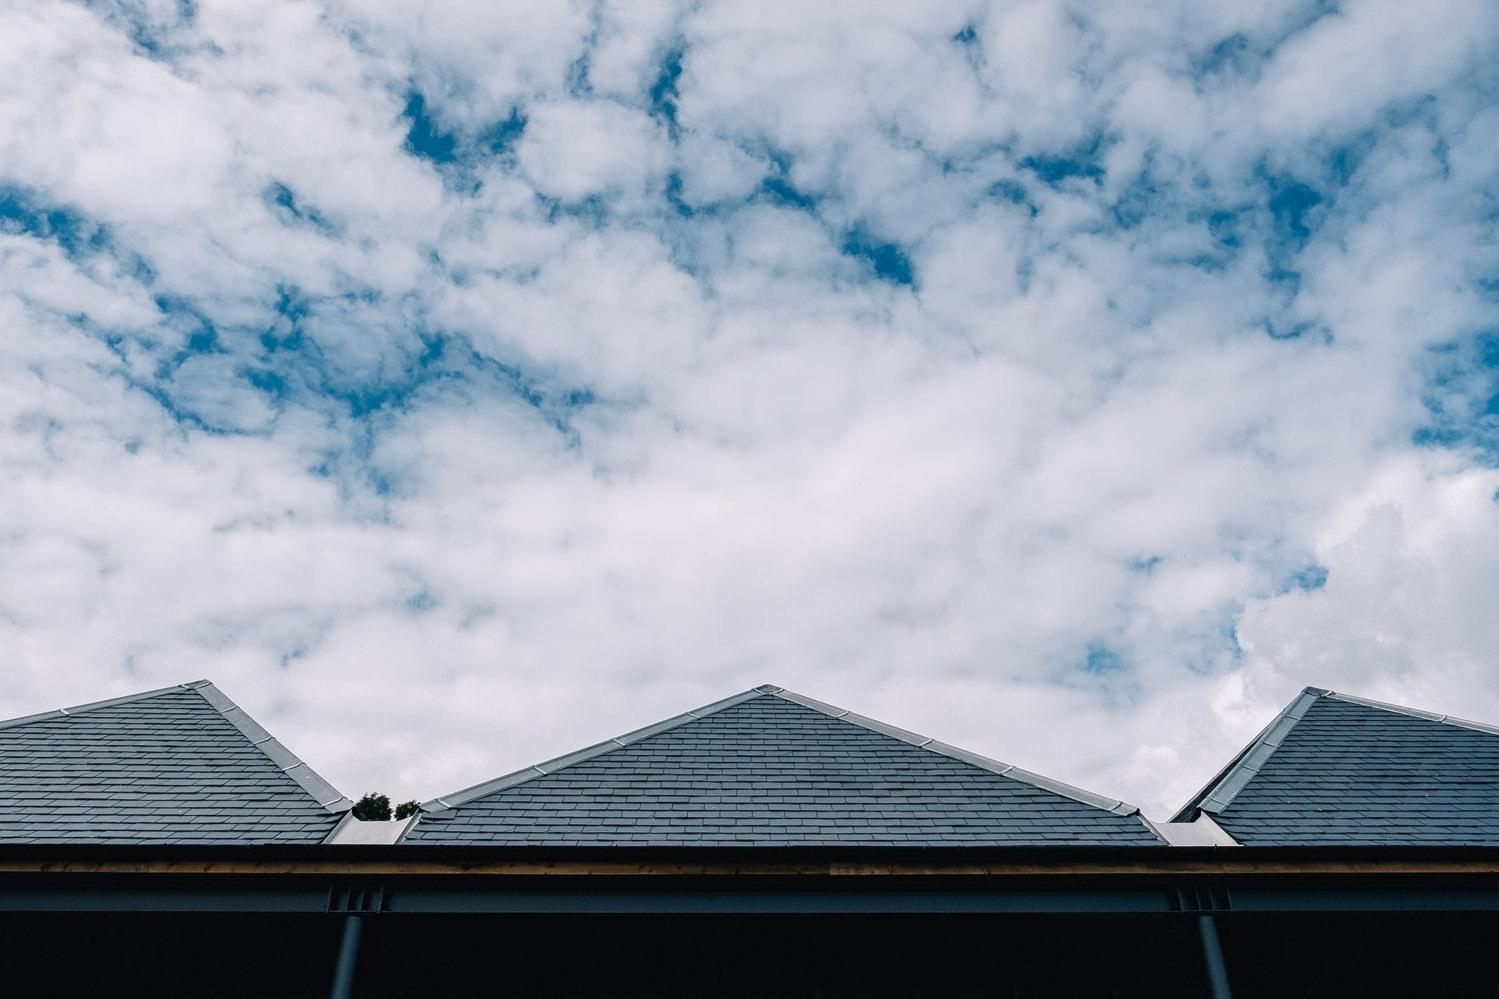 Three raised triangular turrets of the Guardswell Farm barn are in focus.